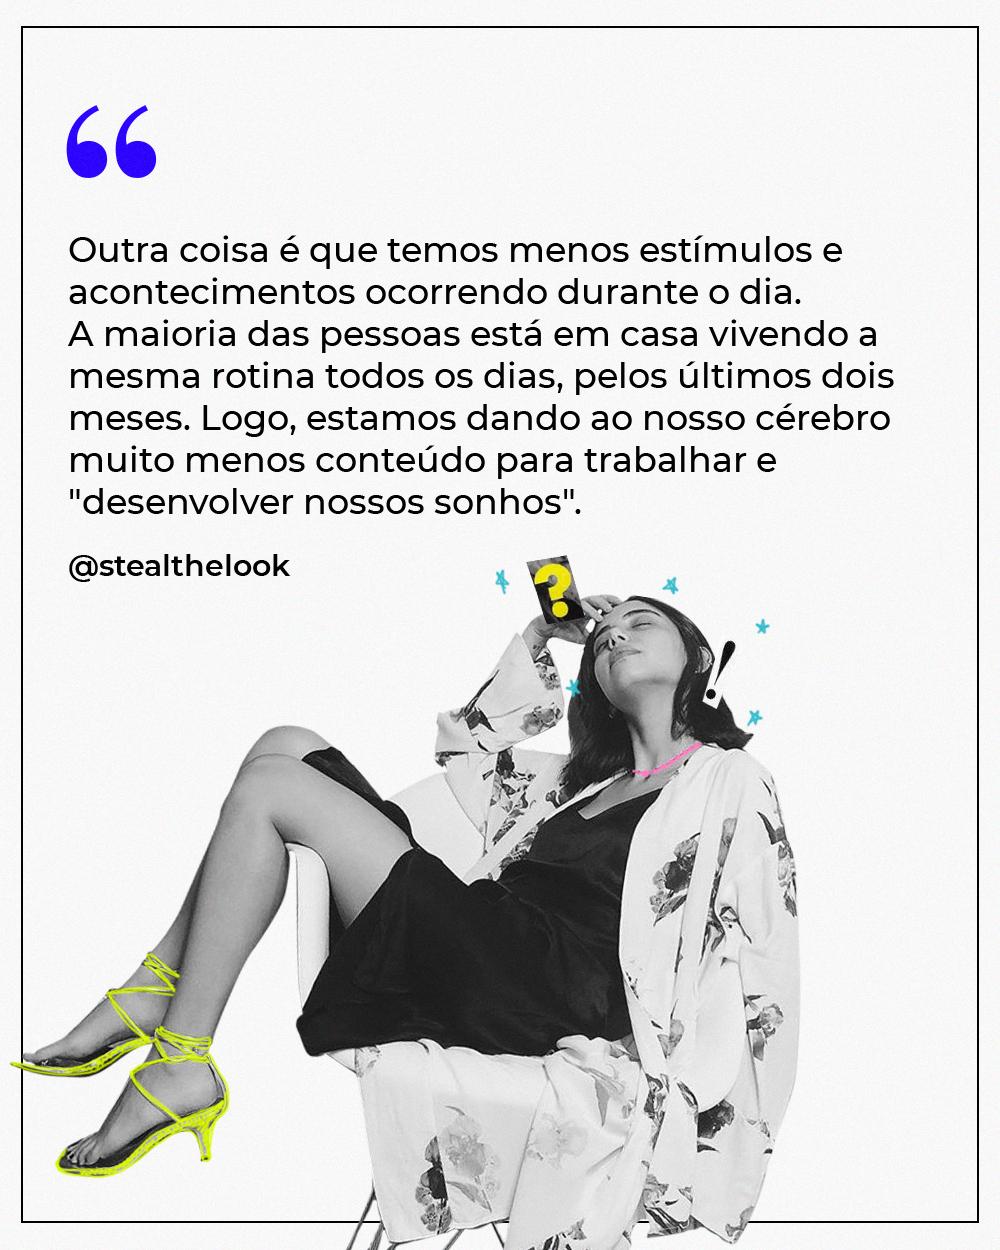 It girls - Pijama - Sonhos estranhos - Outono - Street Style - https://stealthelook.com.br